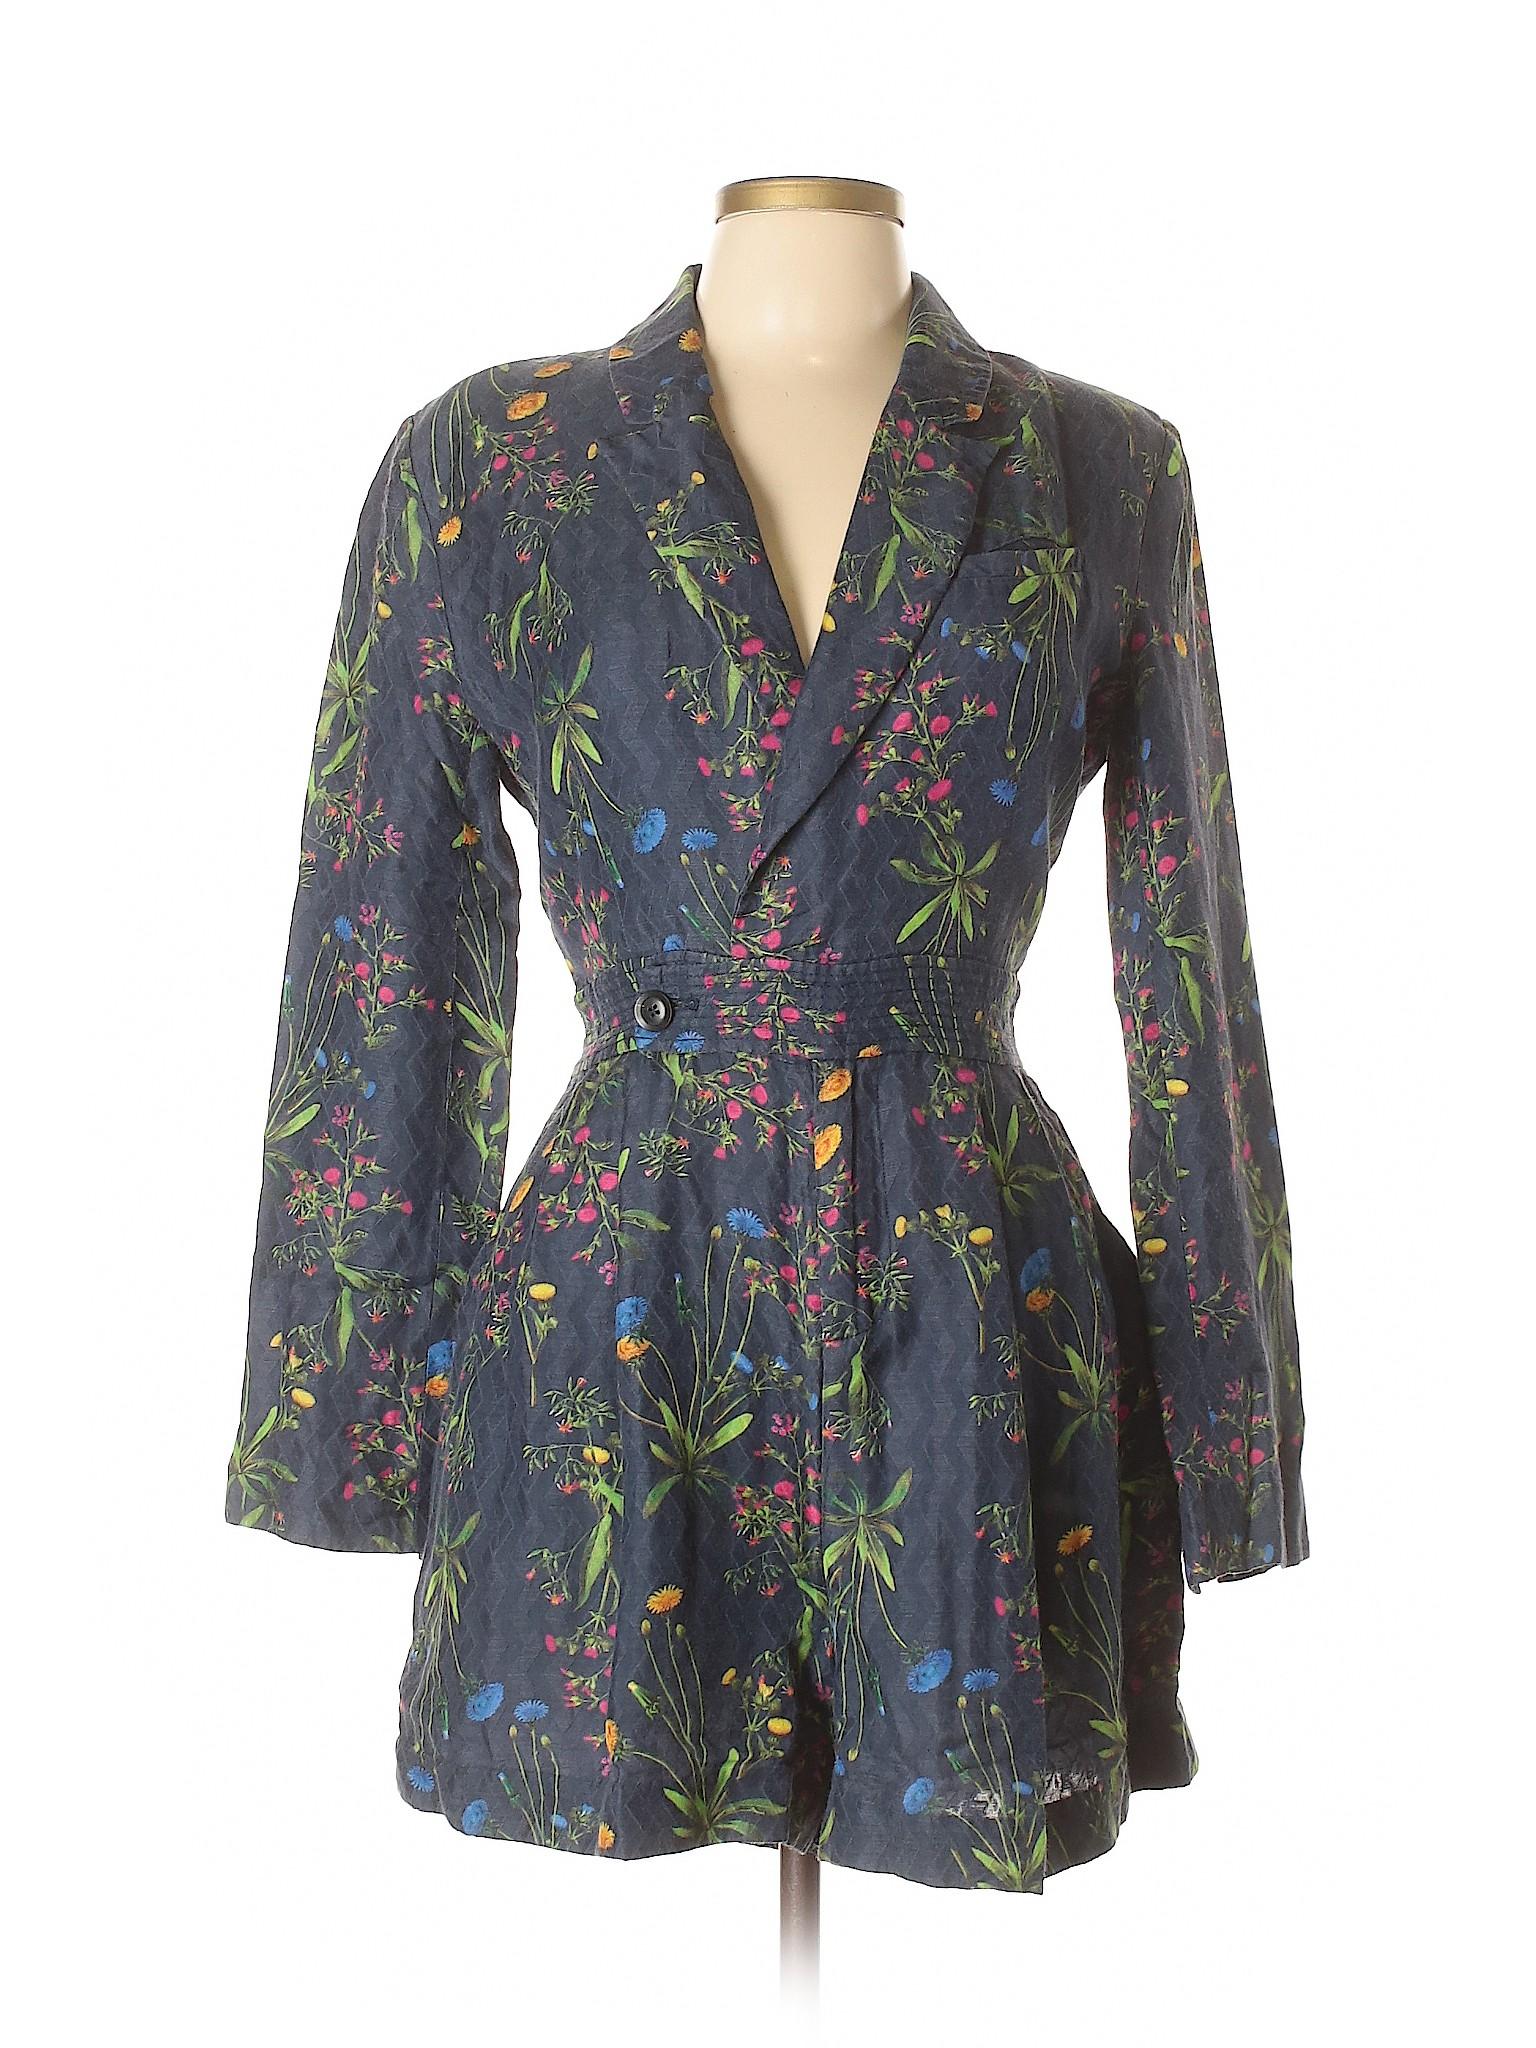 Romper Marissa Selling Suit Edison Webb Jacquard qXwn4wOR